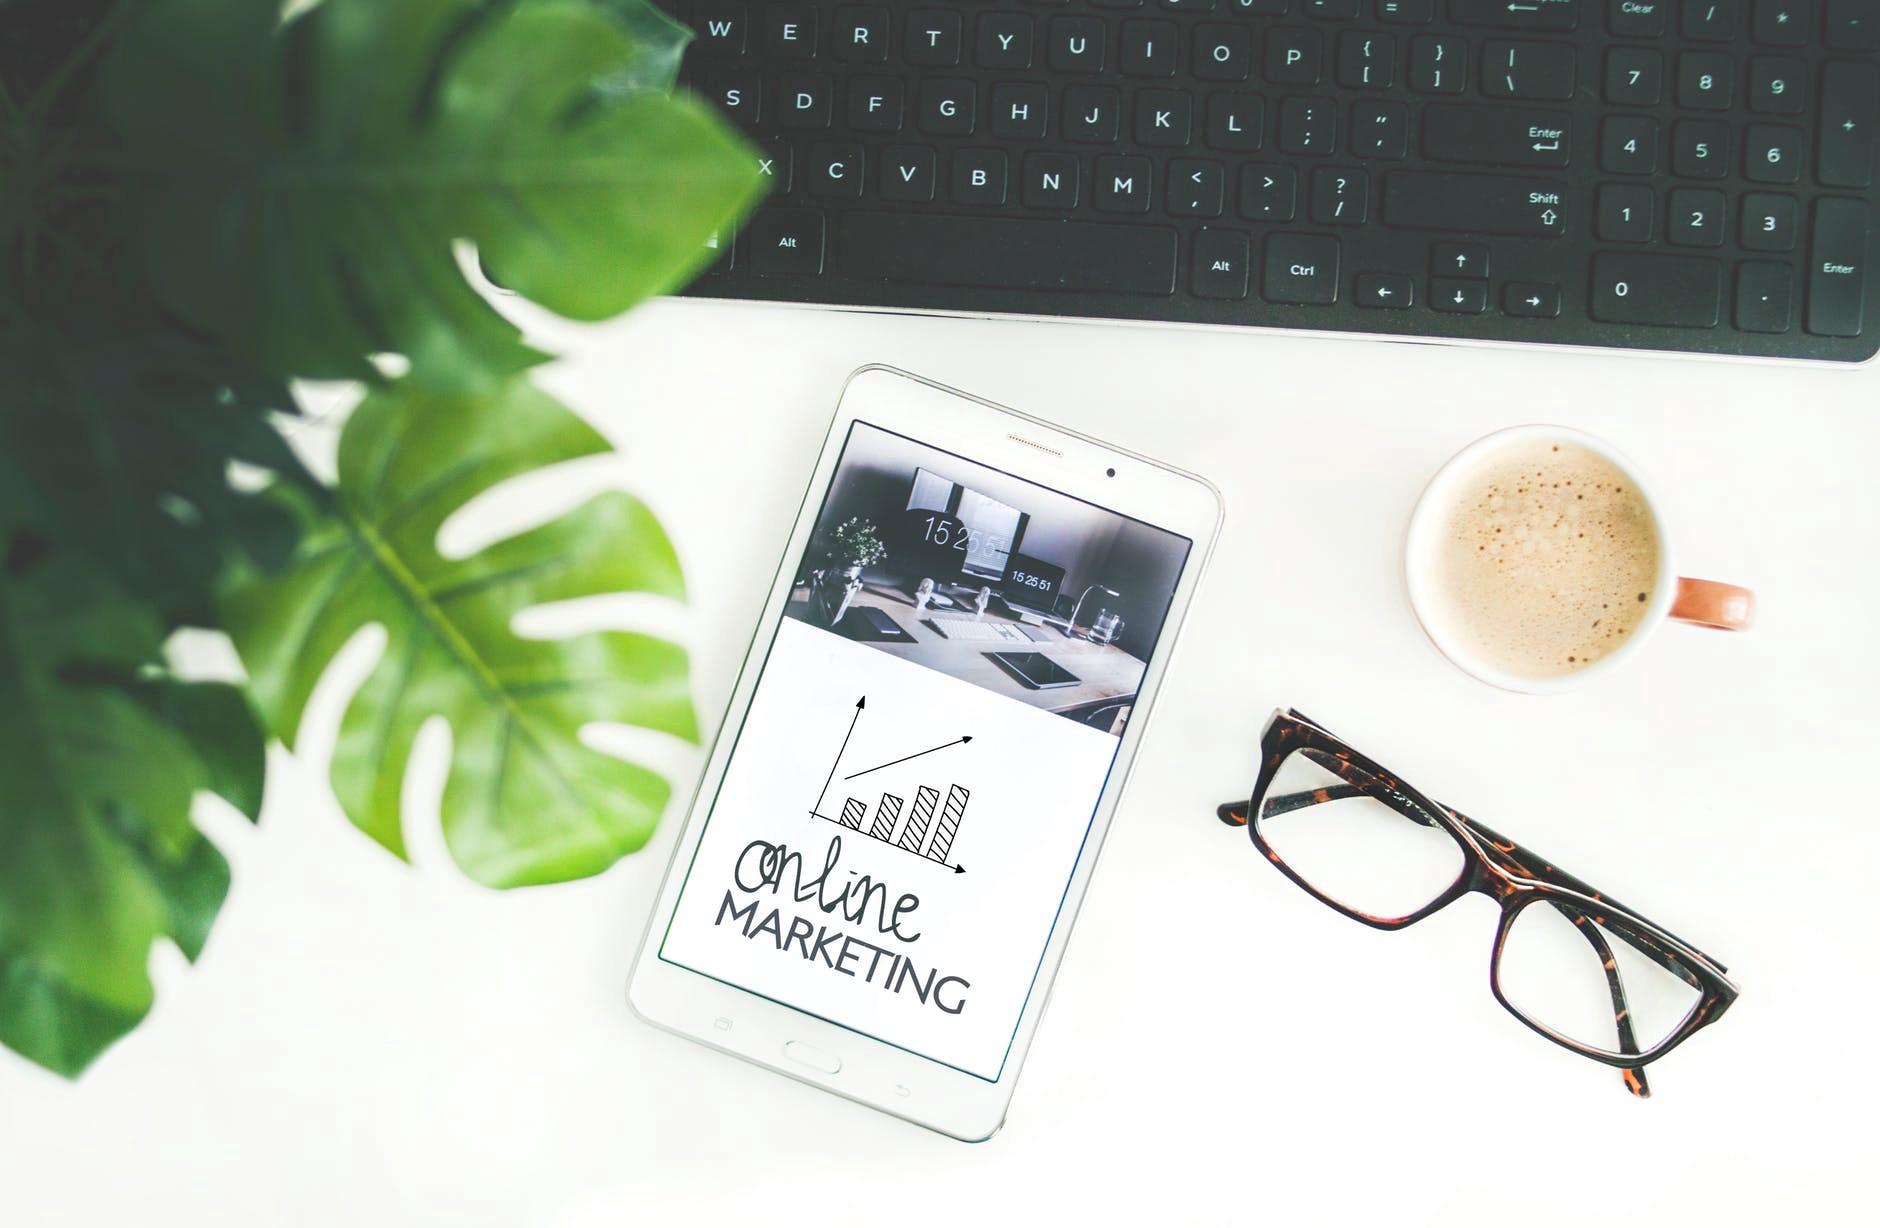 Technical Documentation as a Marketing Tool